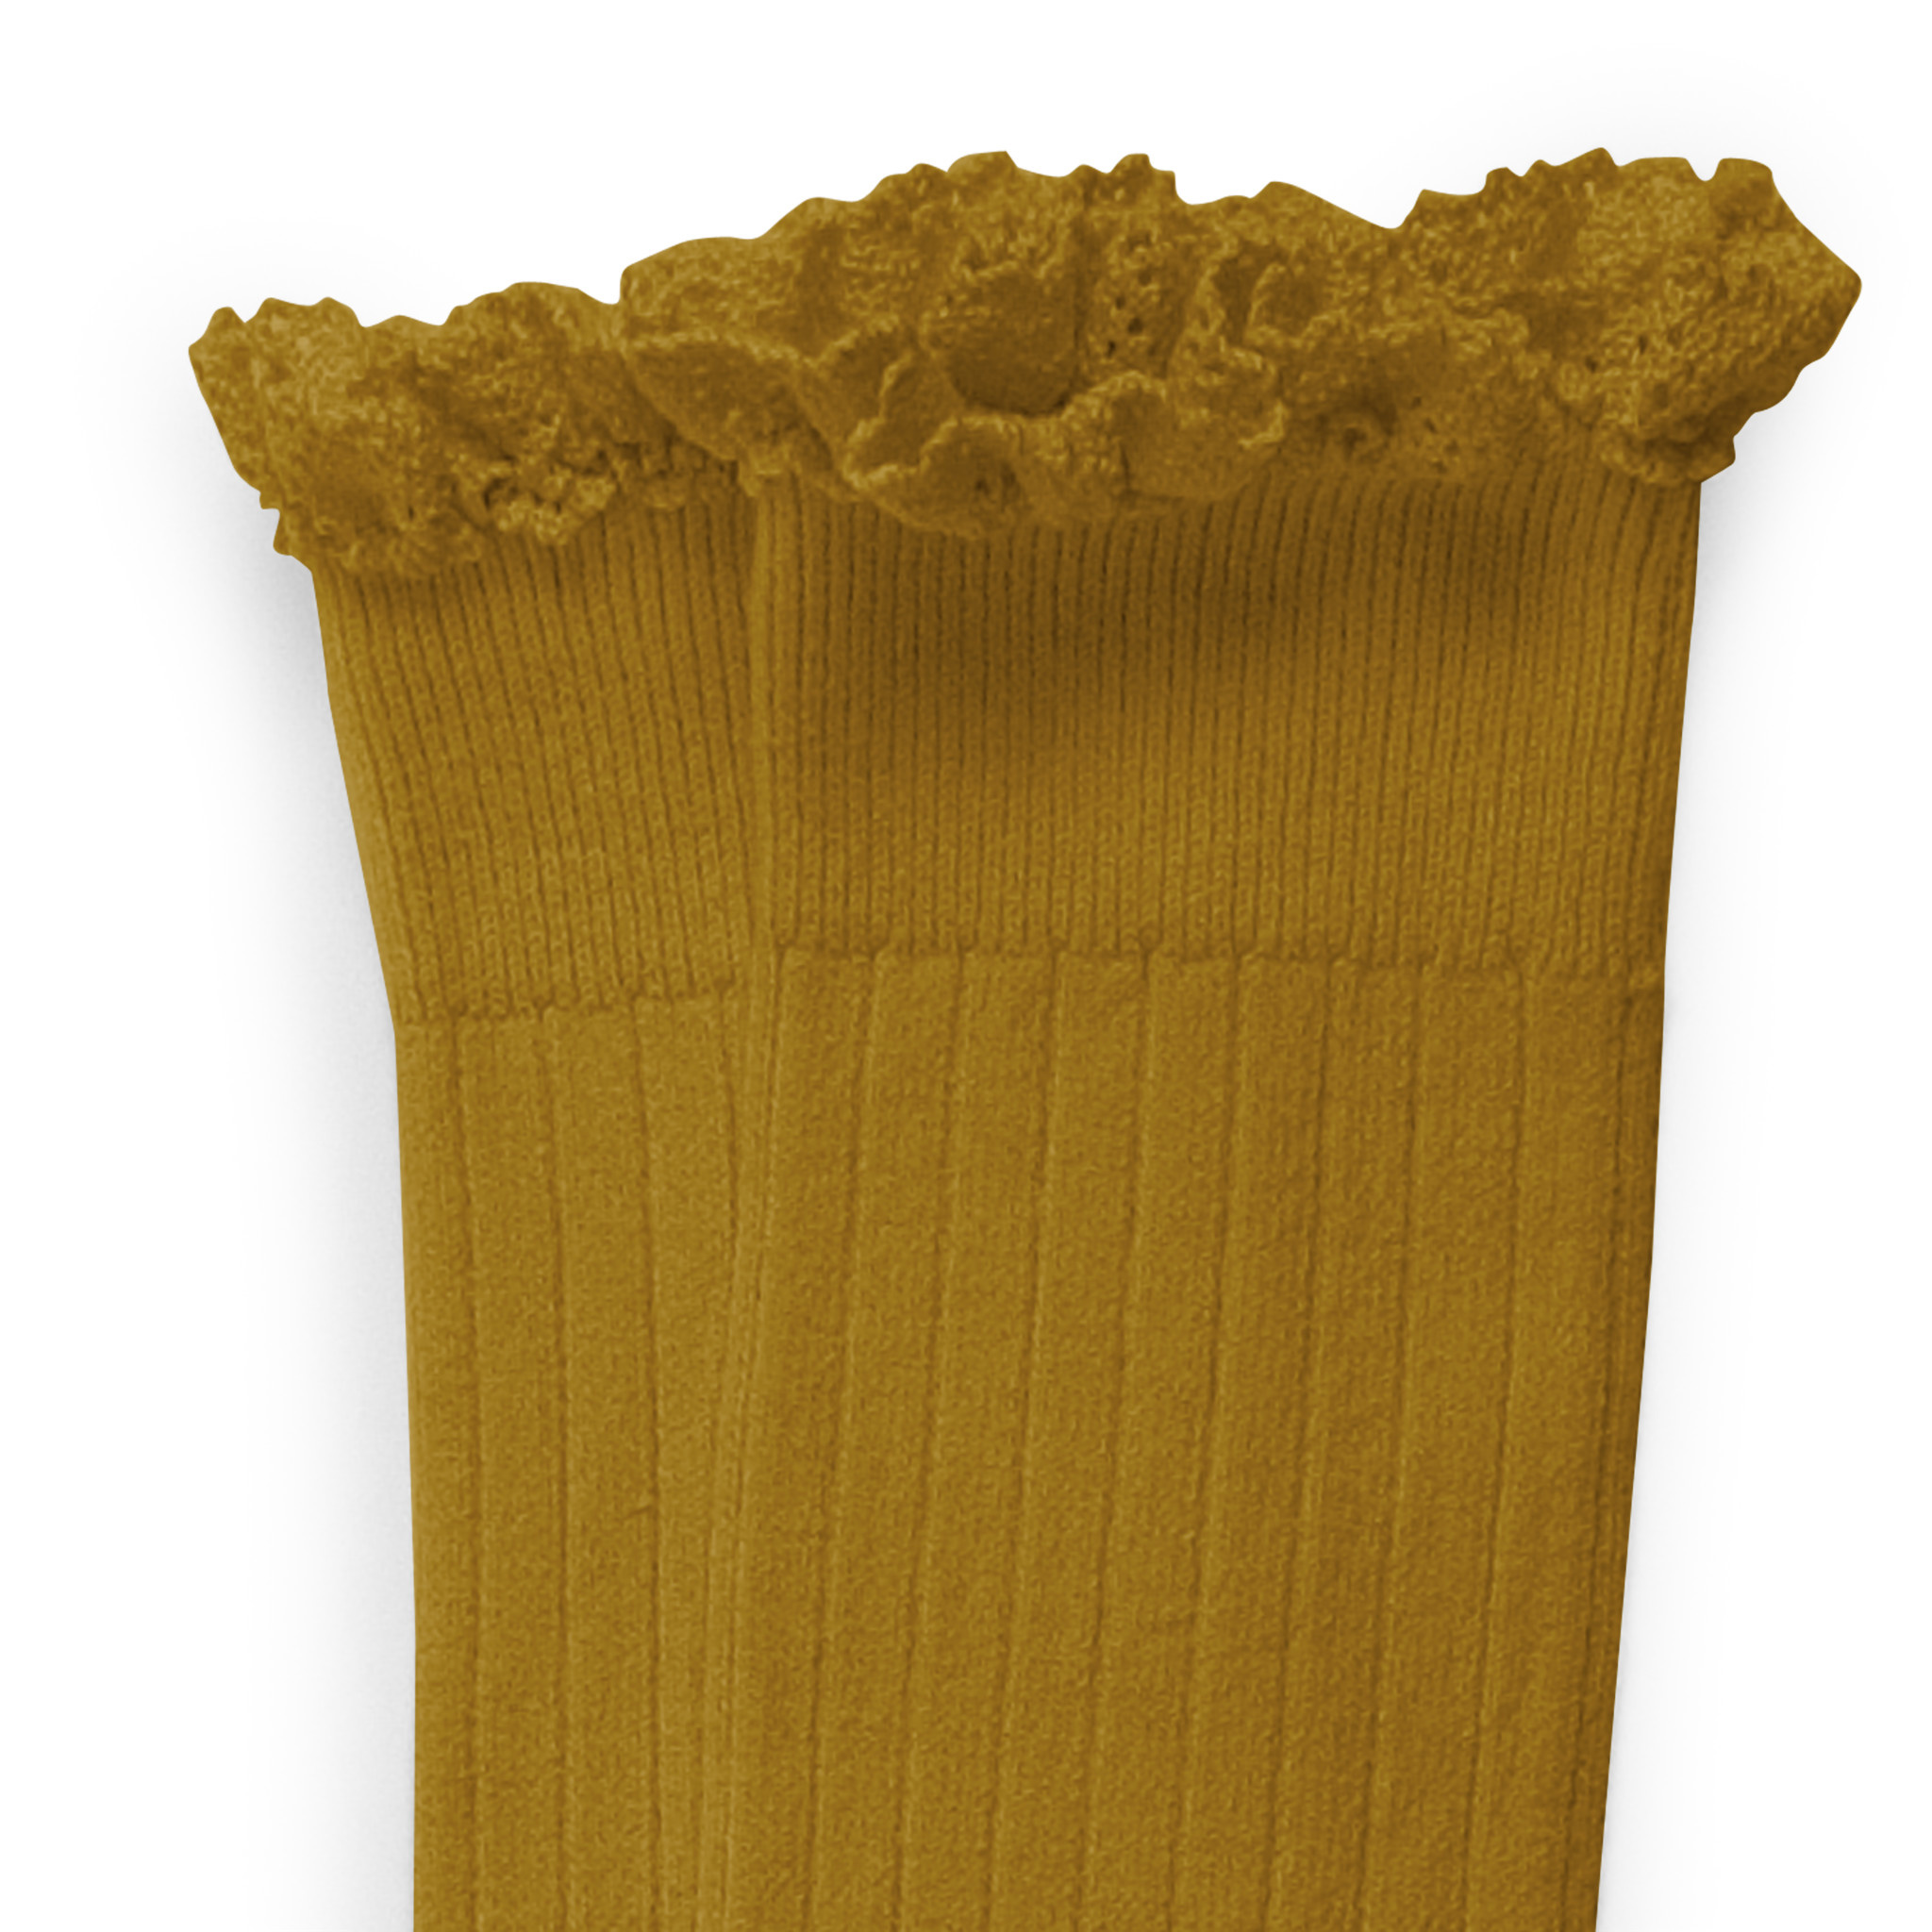 Knee Socks Lace 'Joséphine' Moutarde De Dijon-1